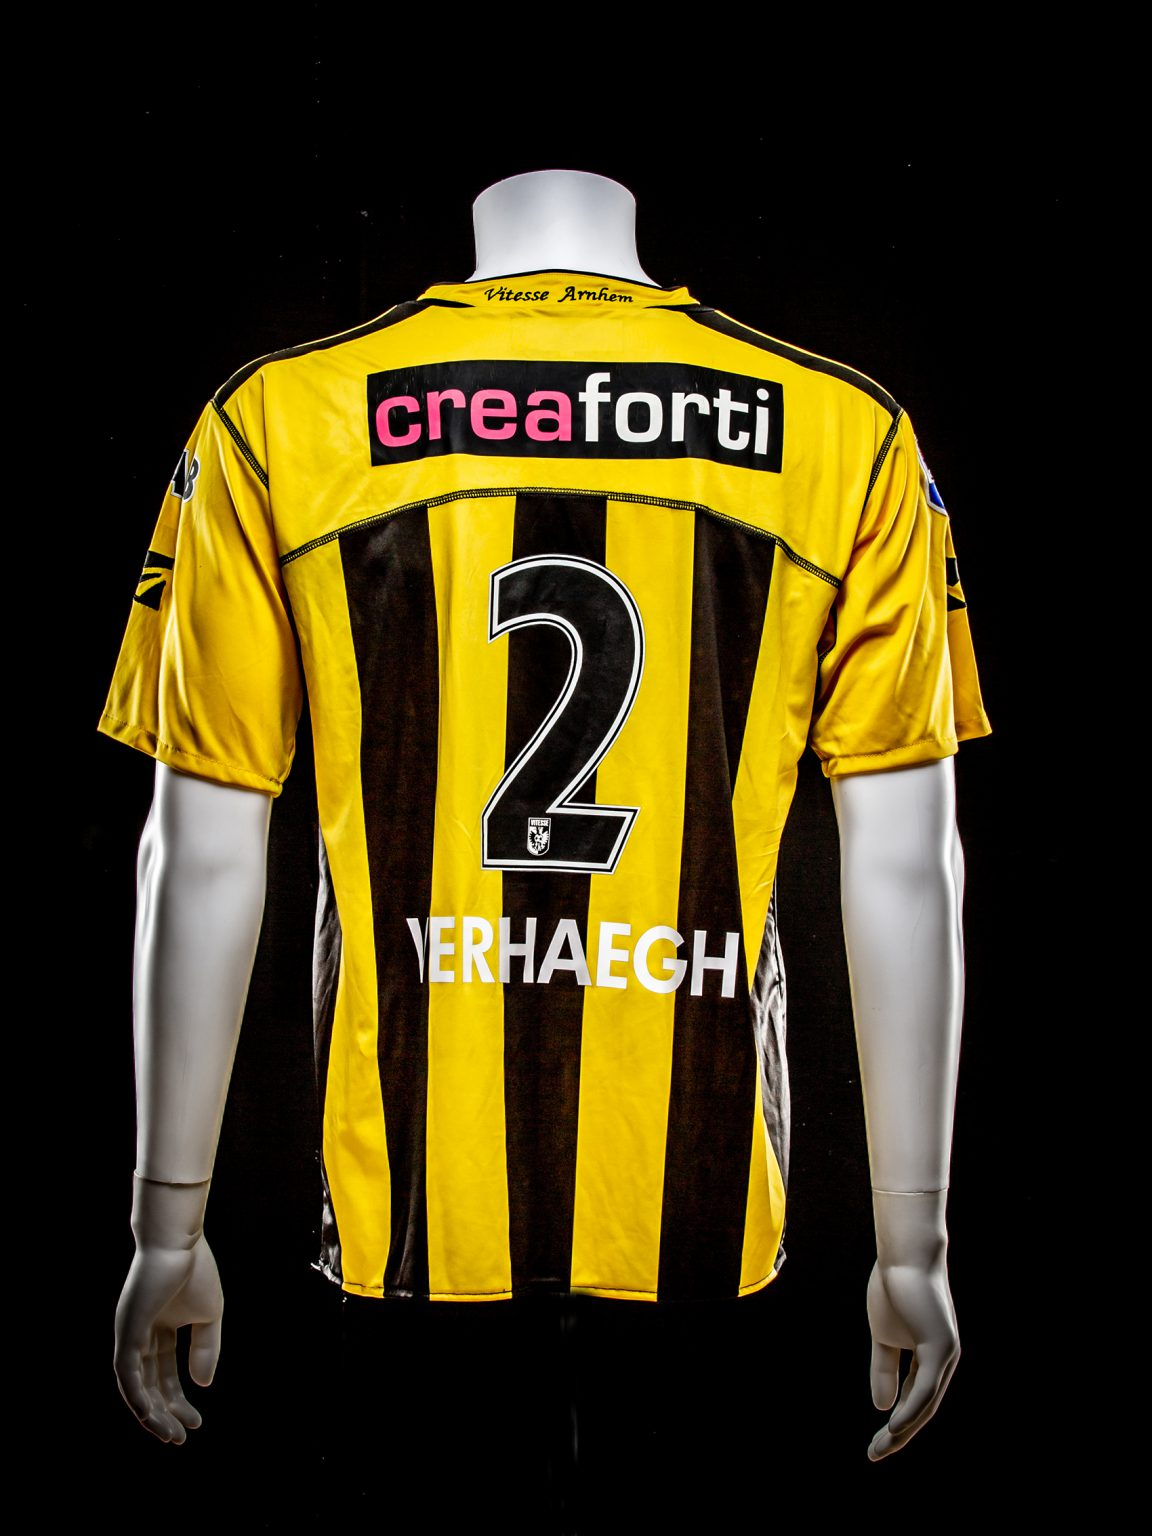 #2 Vitesse Creaforti Paul Verhaegh